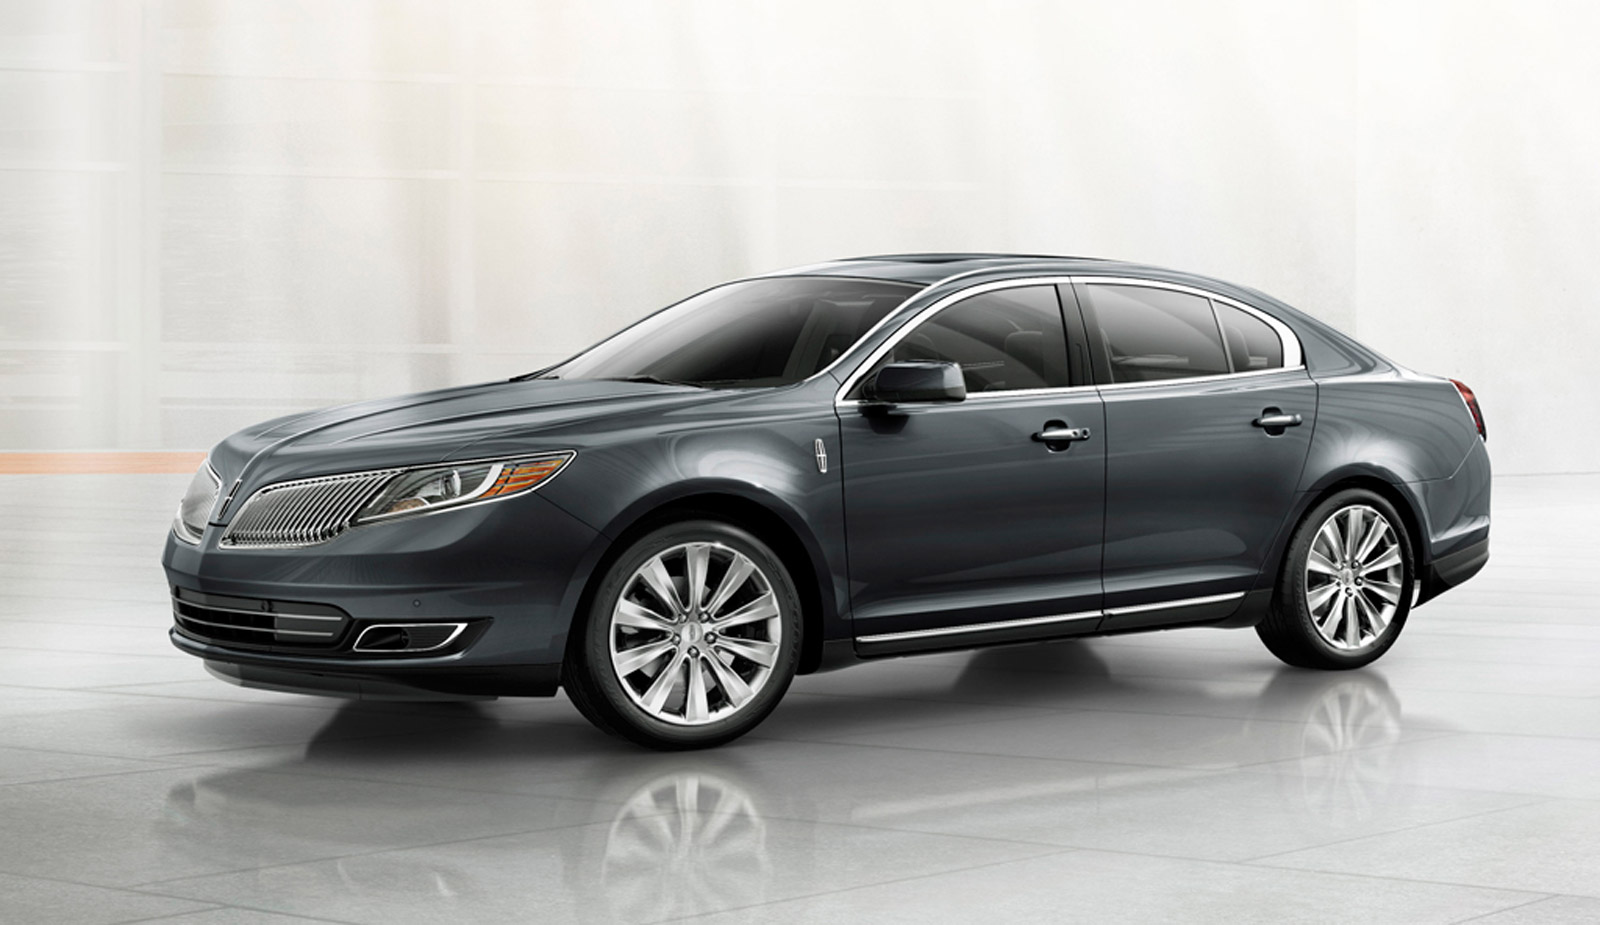 2014 Lincoln Mks Spy Shots.html | Autos Post